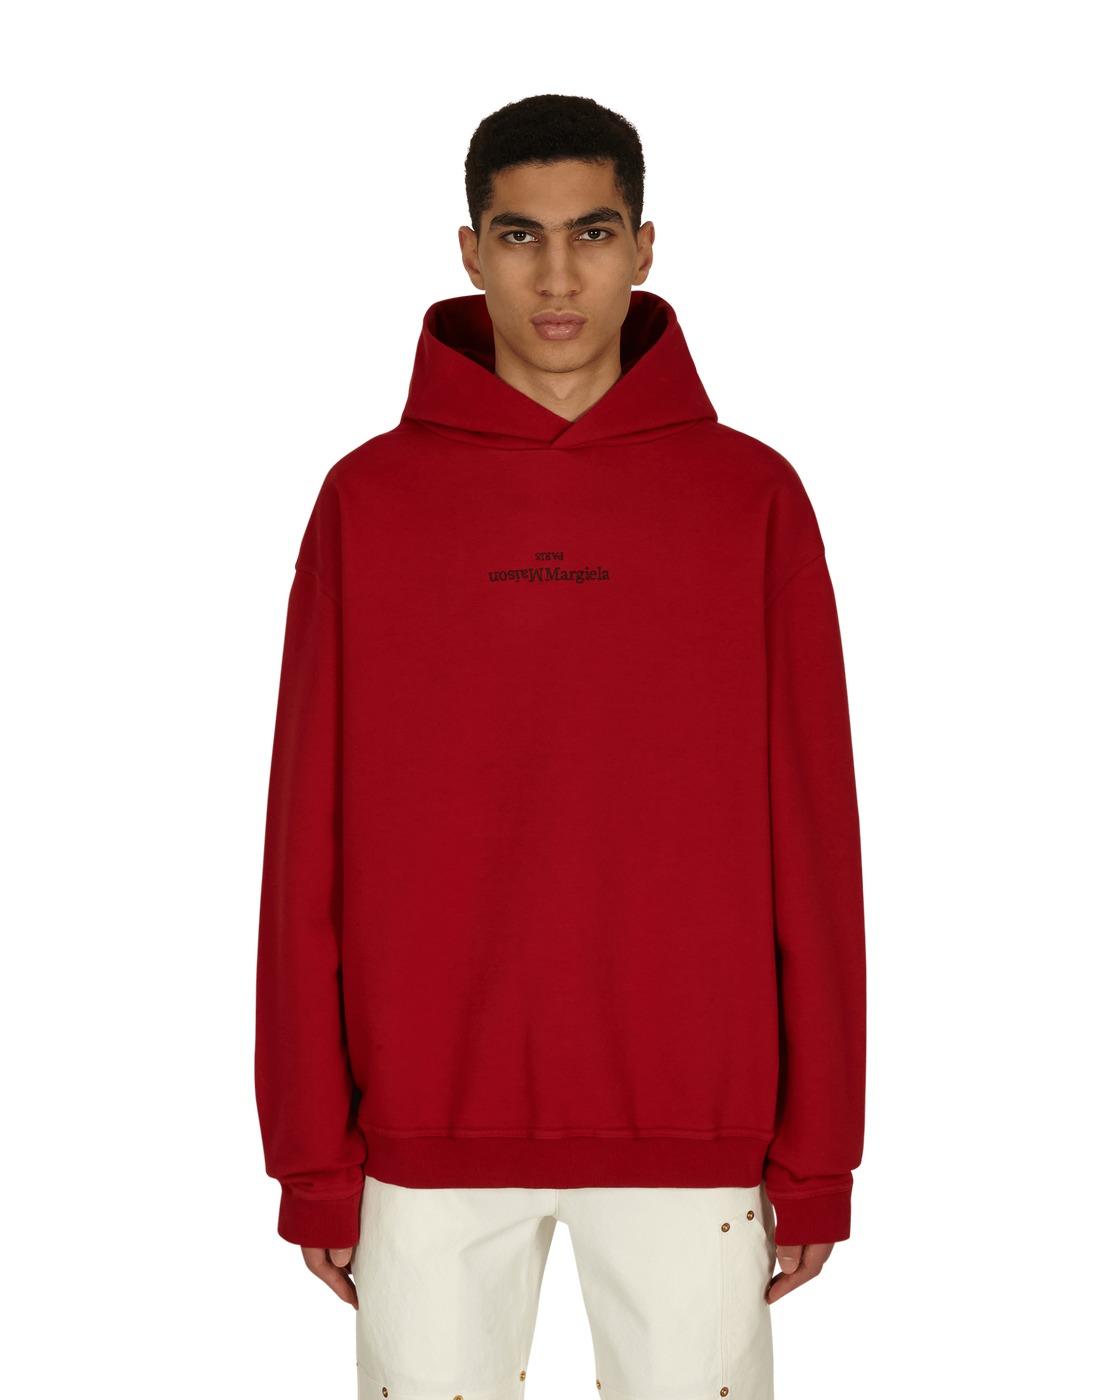 Photo: Maison Margiela Embroidered Logo Hooded Sweatshirt Military Red